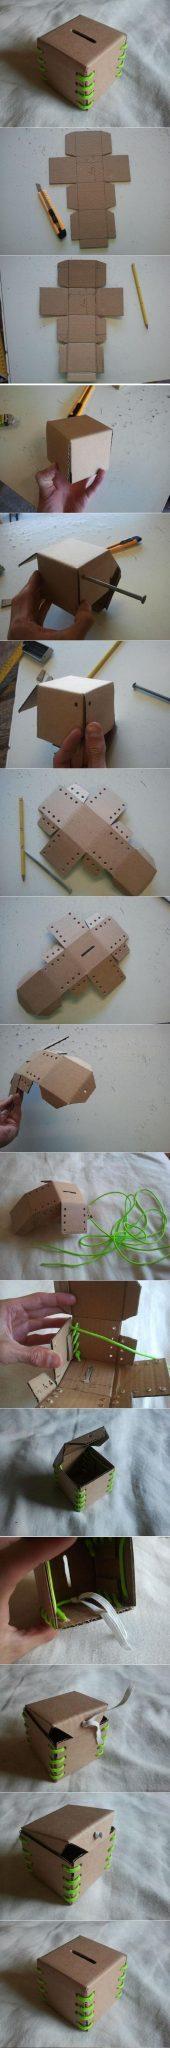 DIY-Cardboard-Piggy-Bank